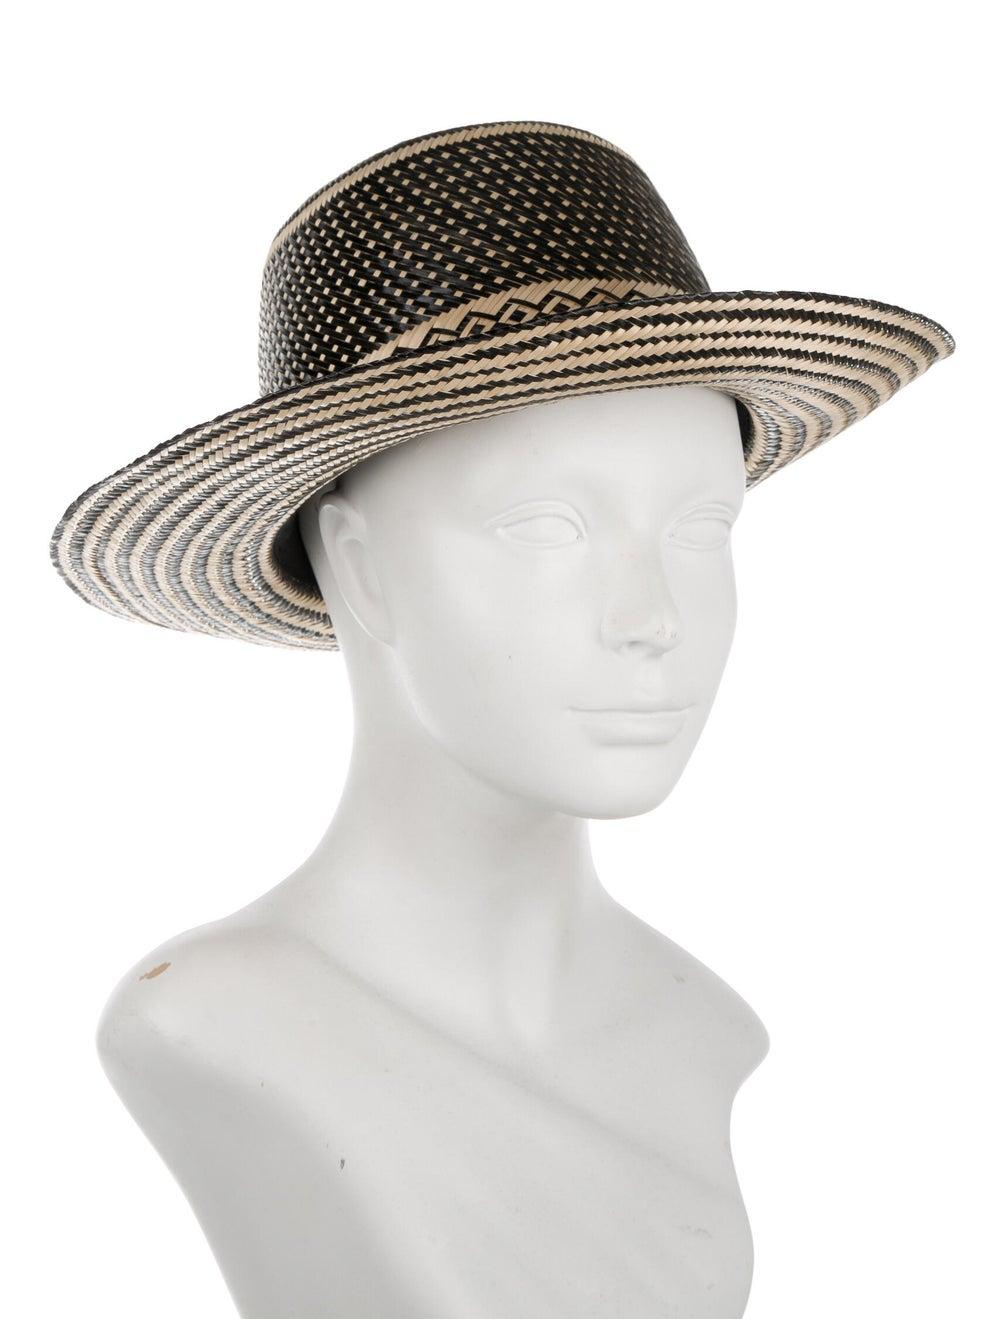 Yosuzi Straw Wide Brim Hat Tan - image 3